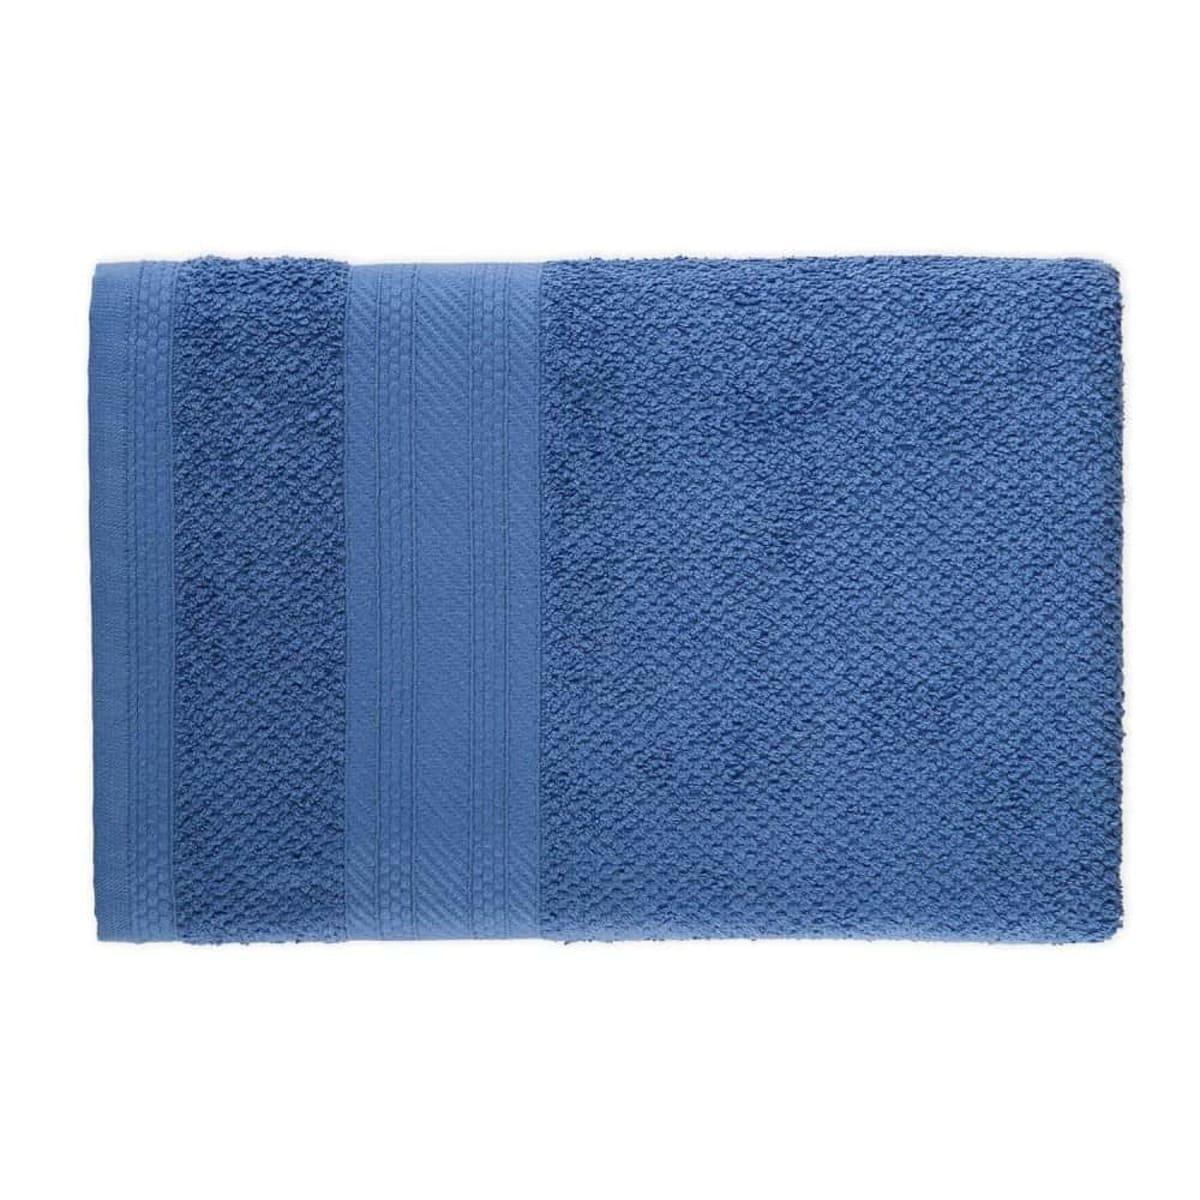 Toalha rosto empire 48x70 Azul Pacífico